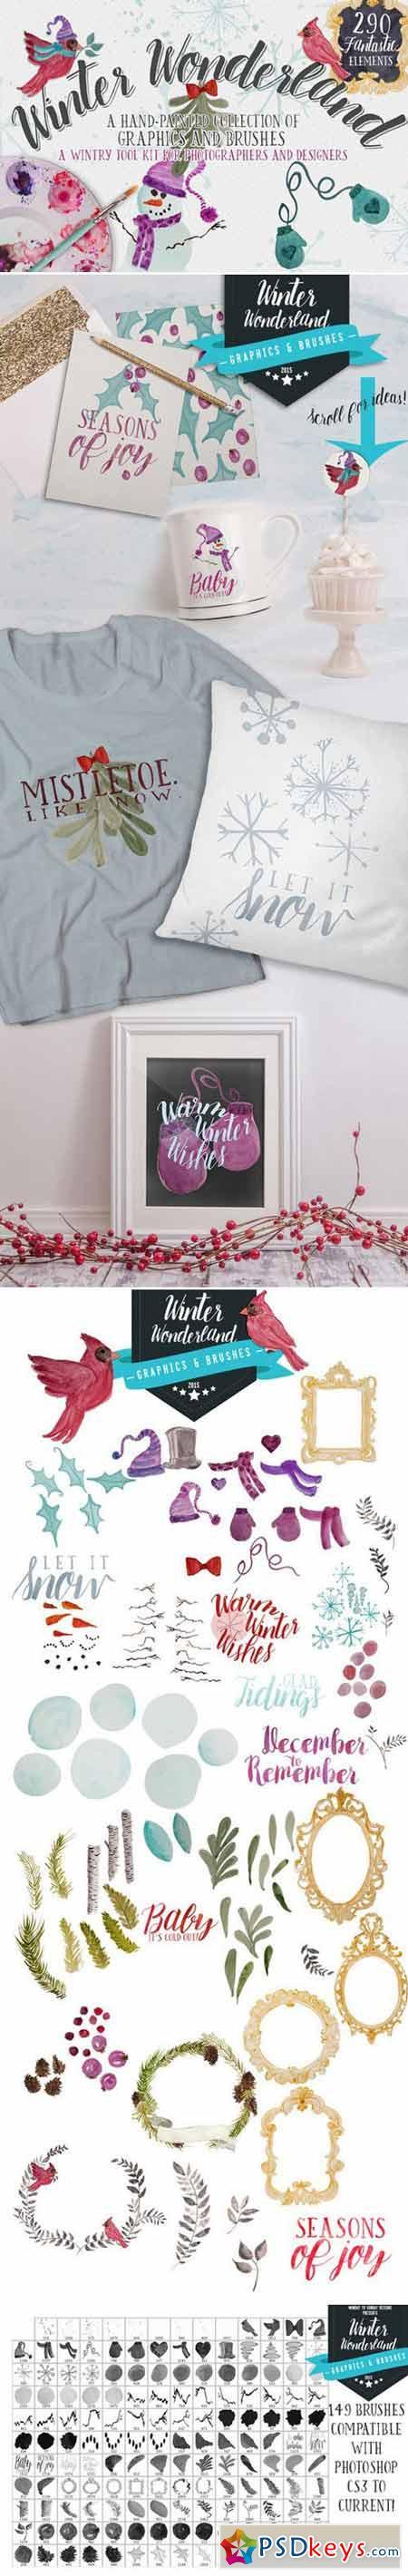 Winter Wonderland Design Tool Kit! 422479